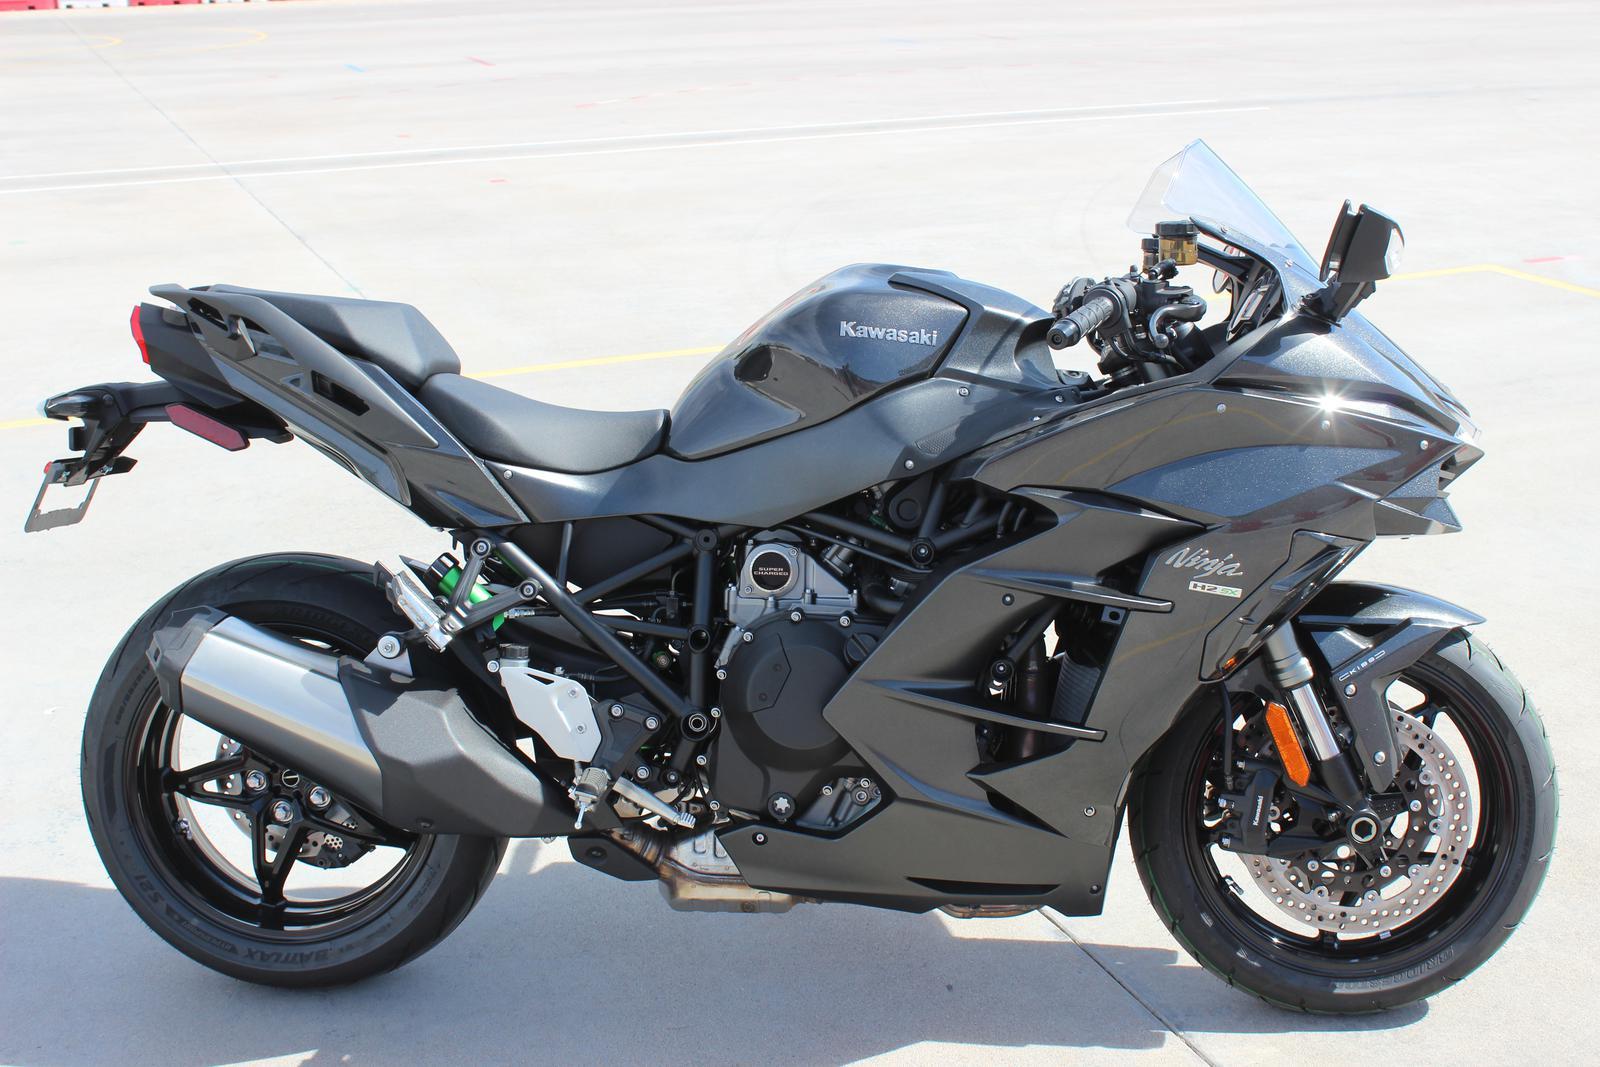 2018 Kawasaki Ninja H2 SX for sale in Scottsdale, AZ. GO AZ ...